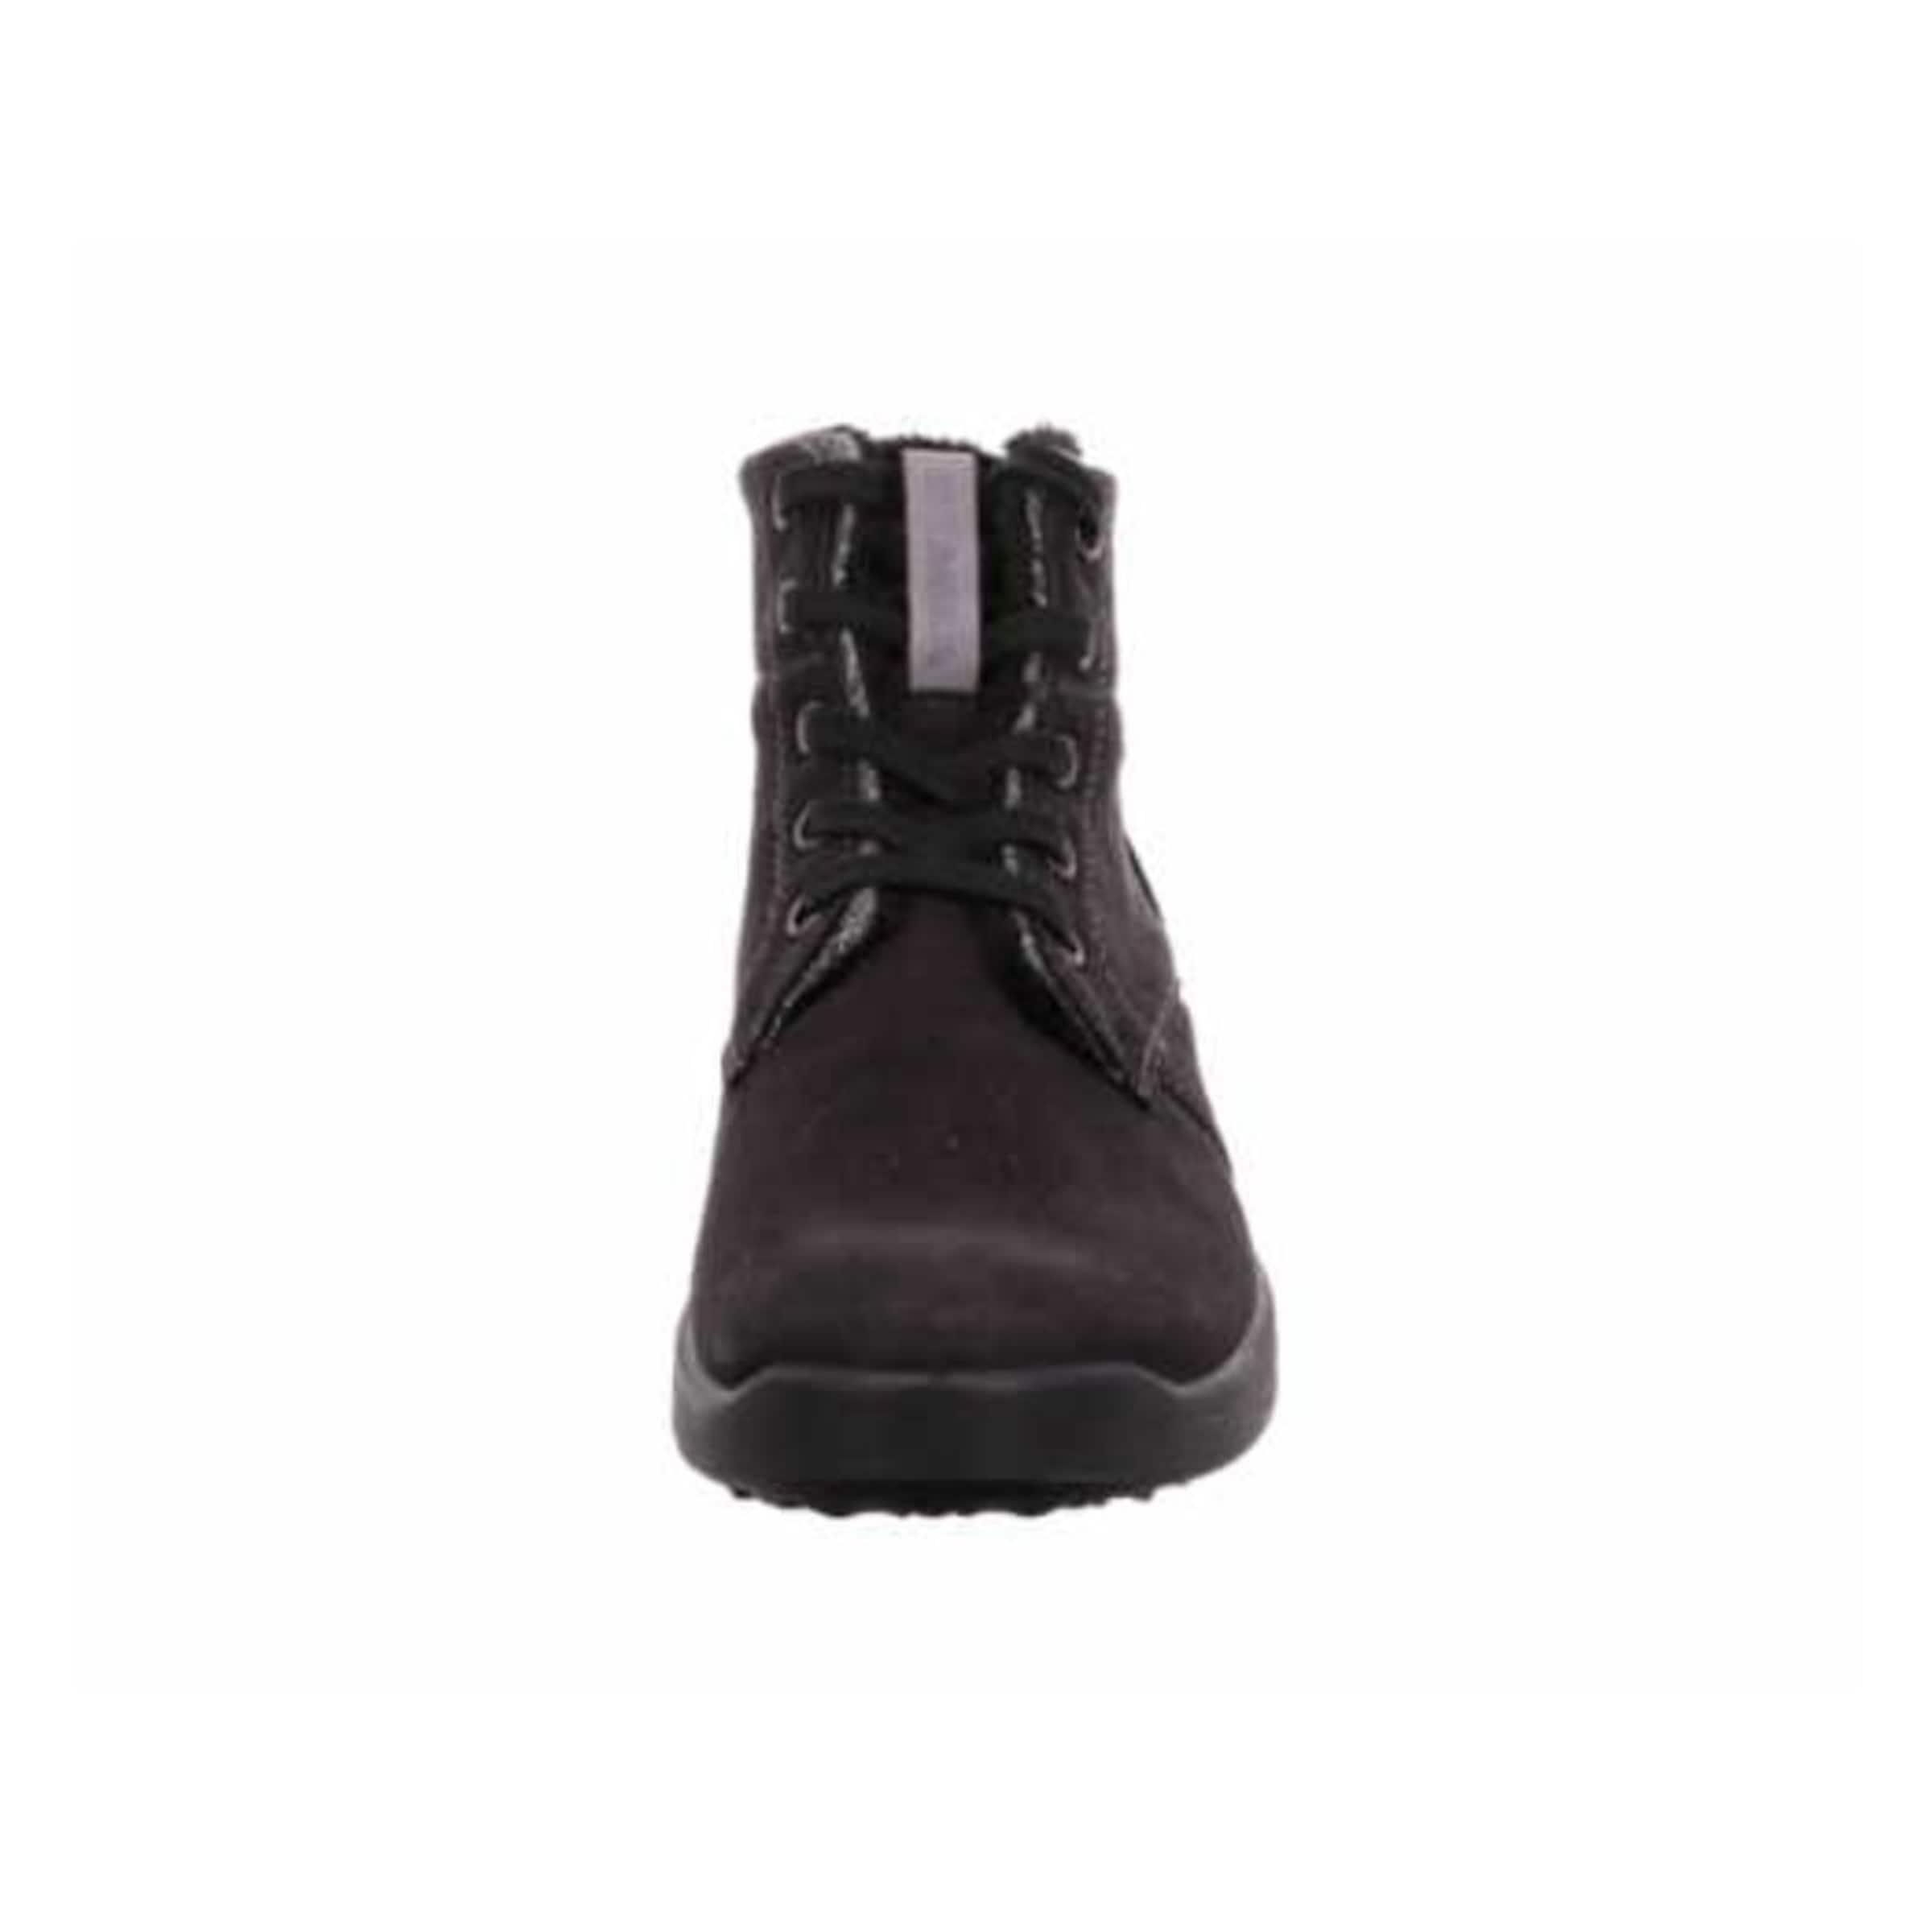 ROMIKA ROMIKA ROMIKA Stiefel Leder Verkaufen Sie saisonale Aktionen 4ba0c8